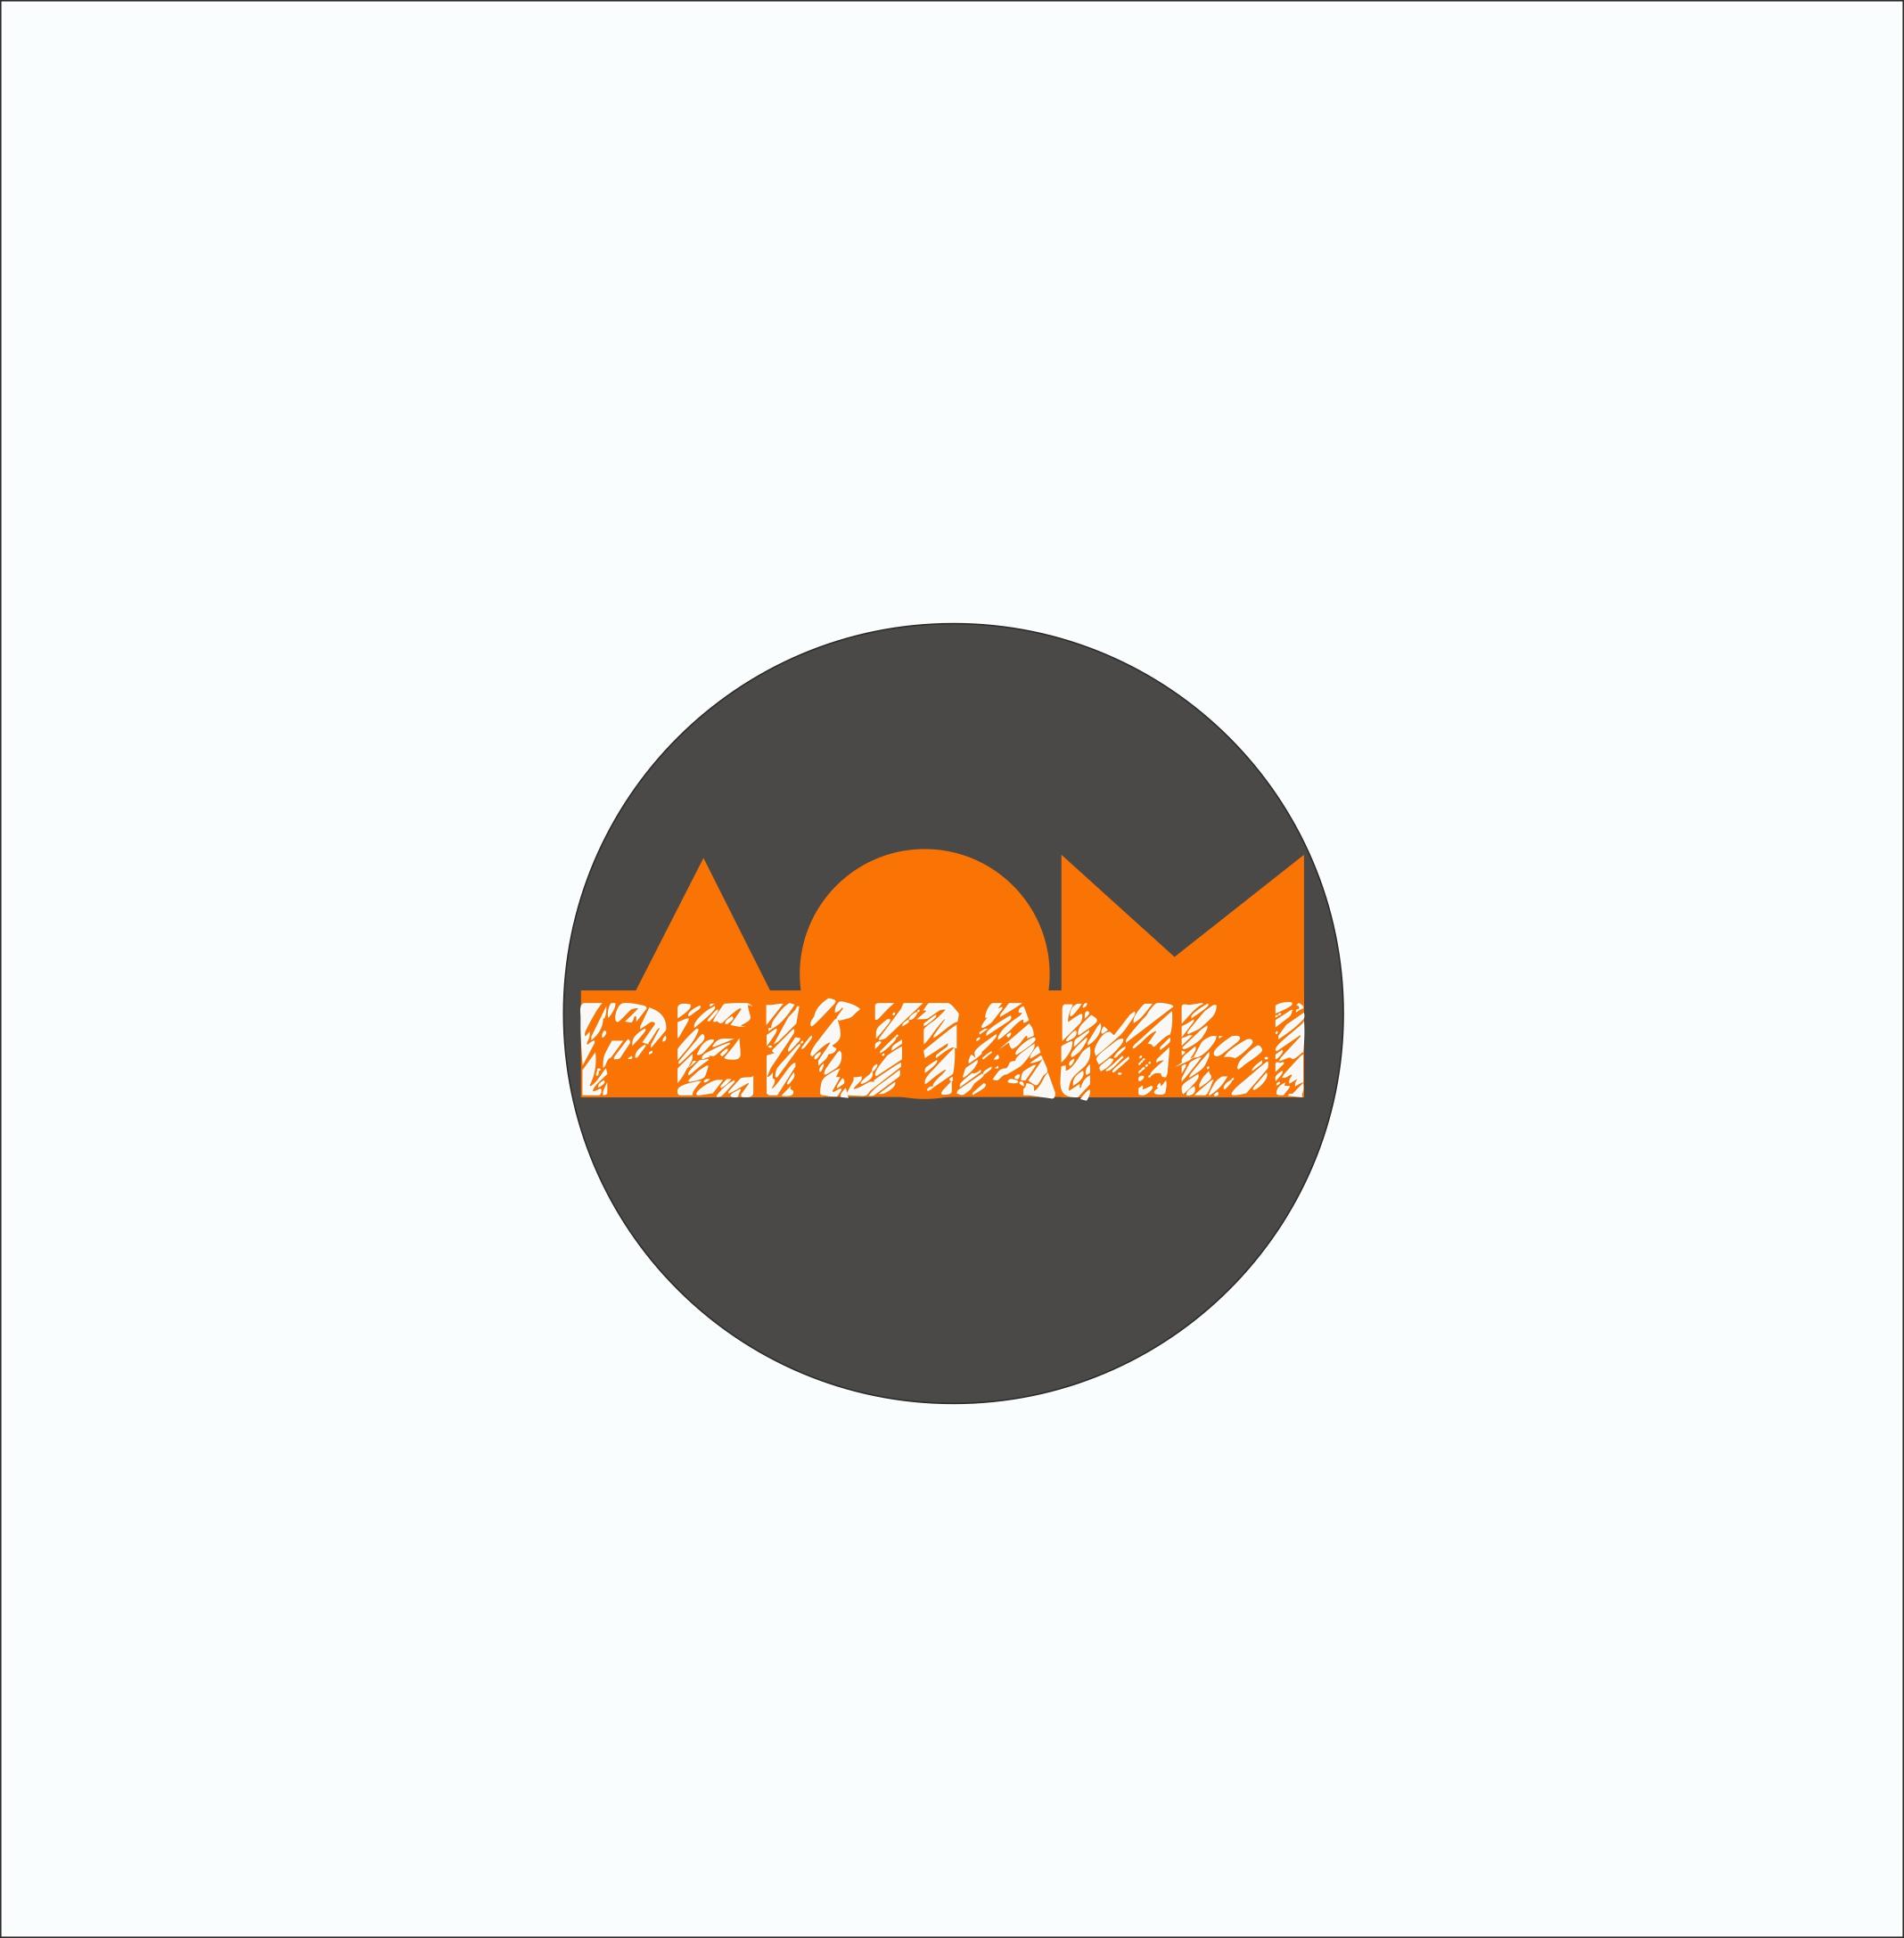 Дизайн логотипа рекламно-производственной компании фото f_3435edda1fe6a613.jpg